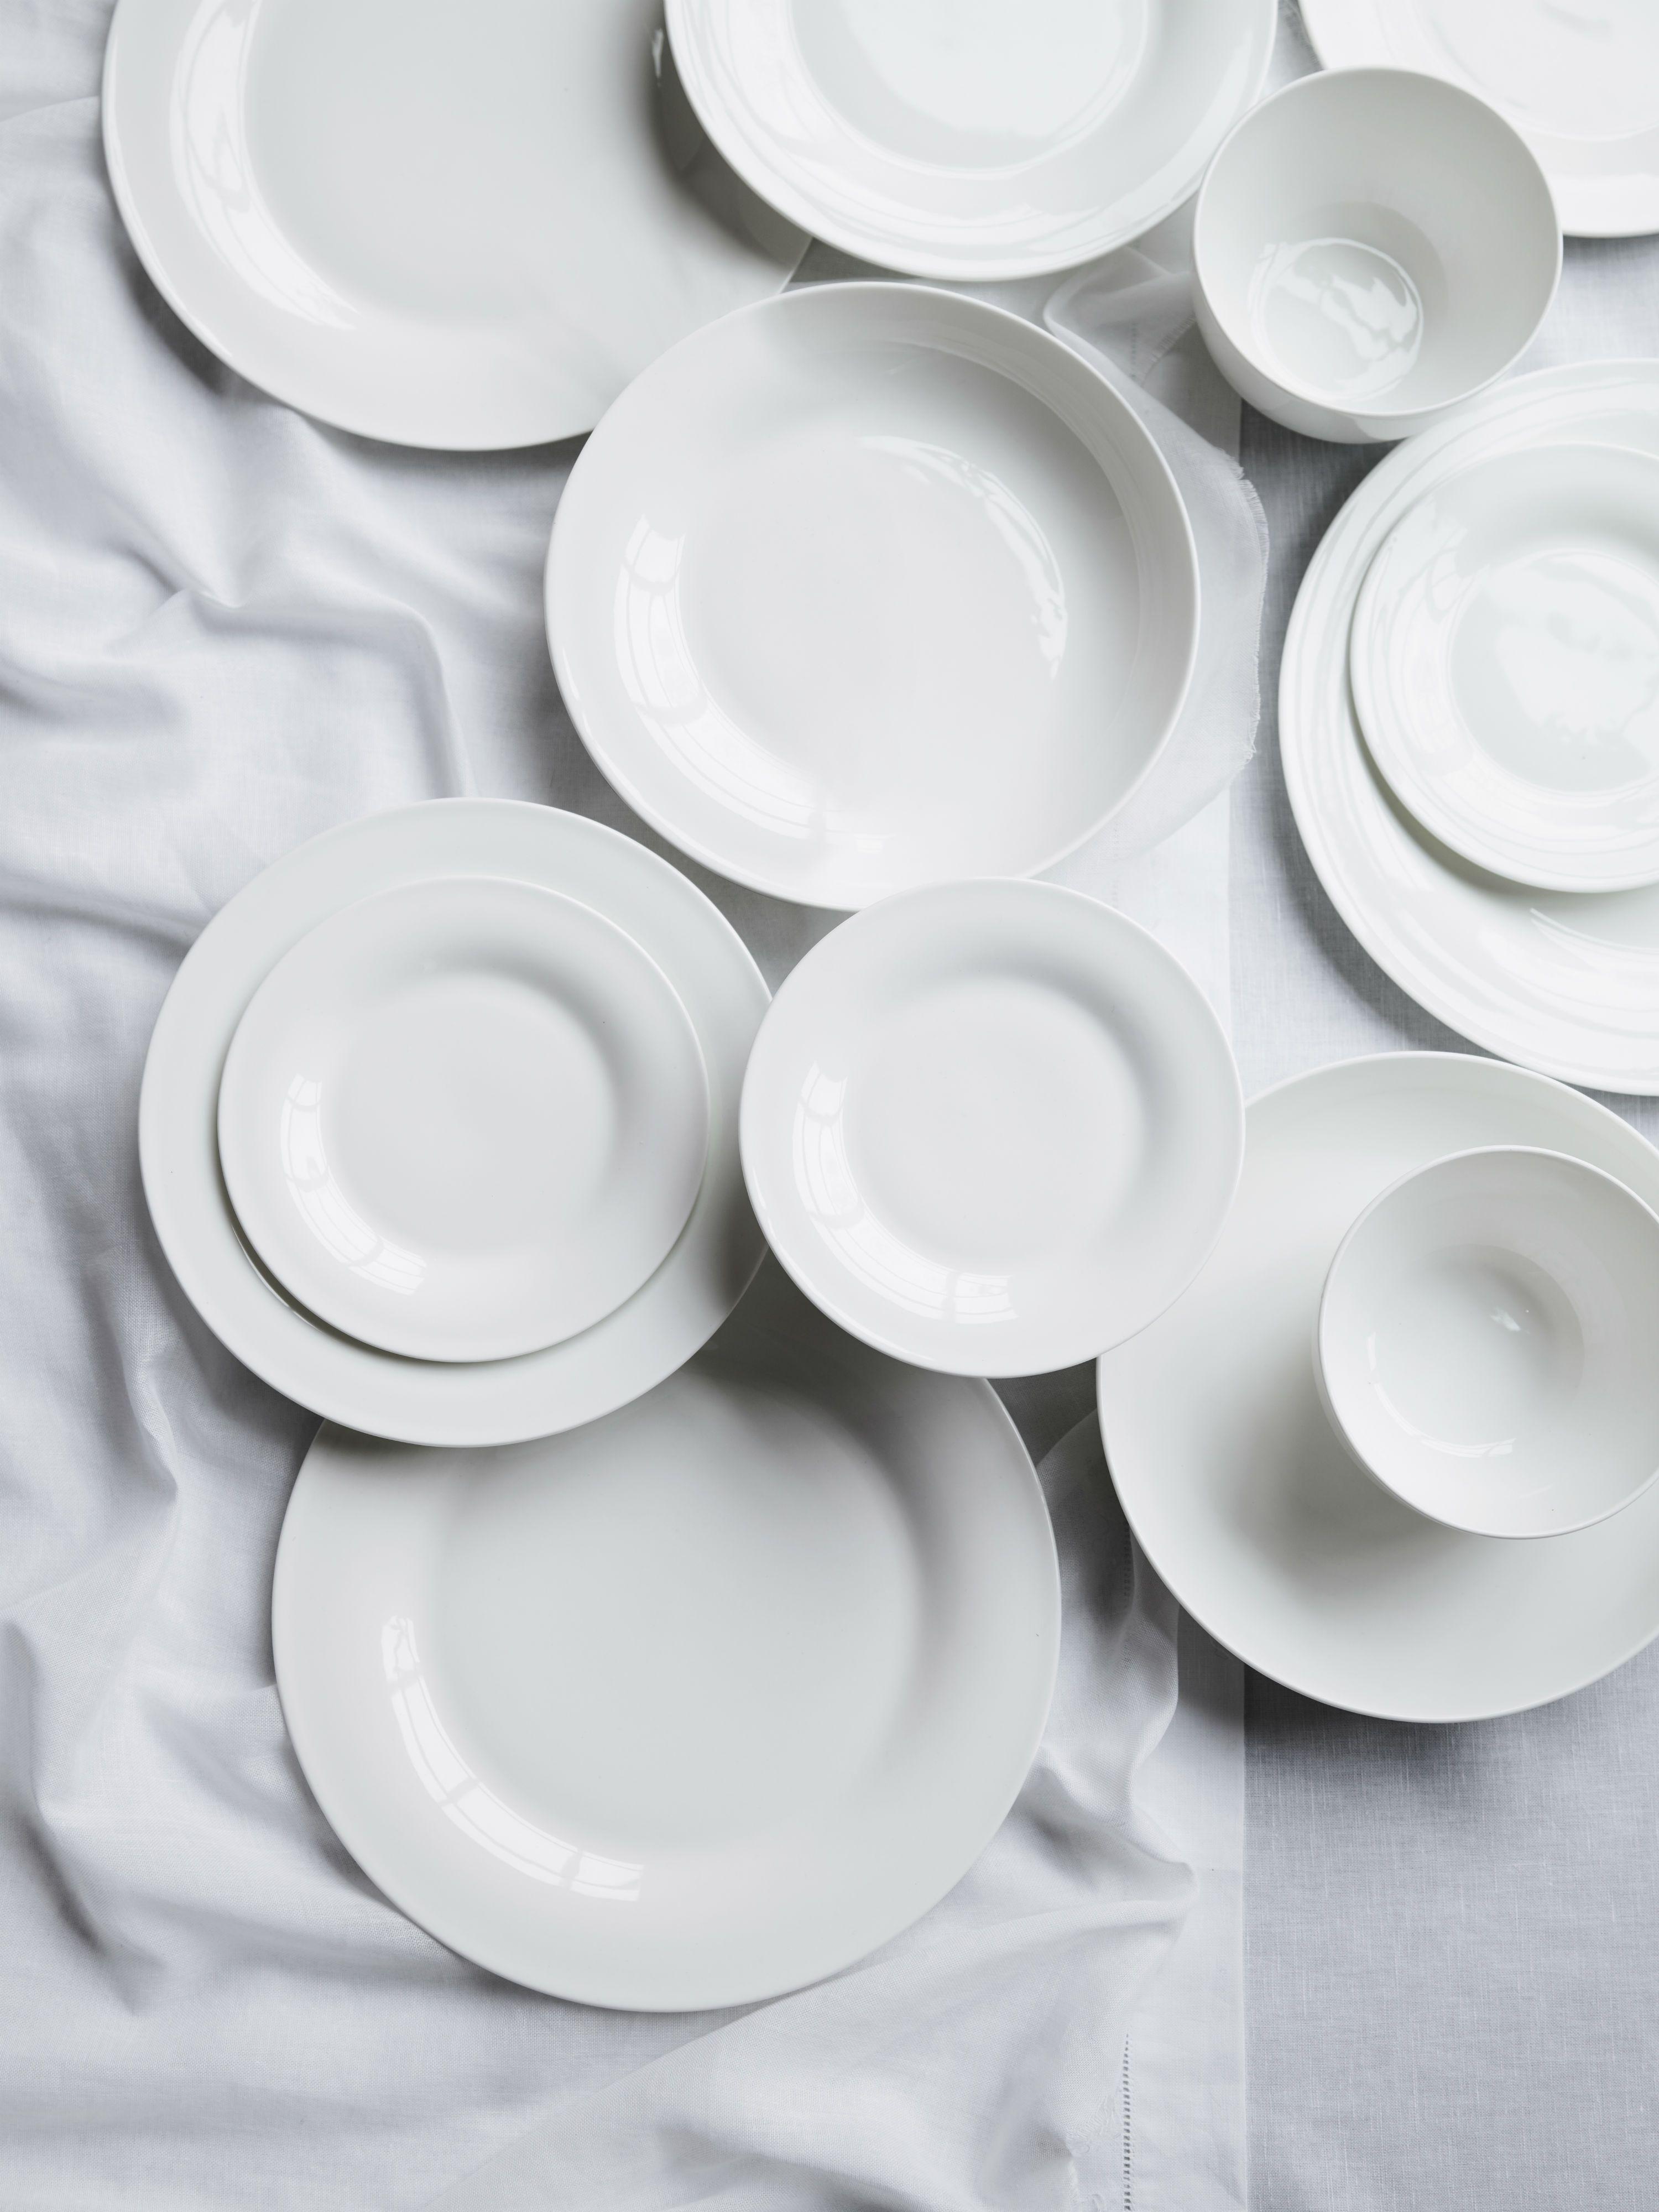 Symons Bone China 12 Piece Set Tableware The White Company Tableware Stylish Kitchen Accessories Bone China